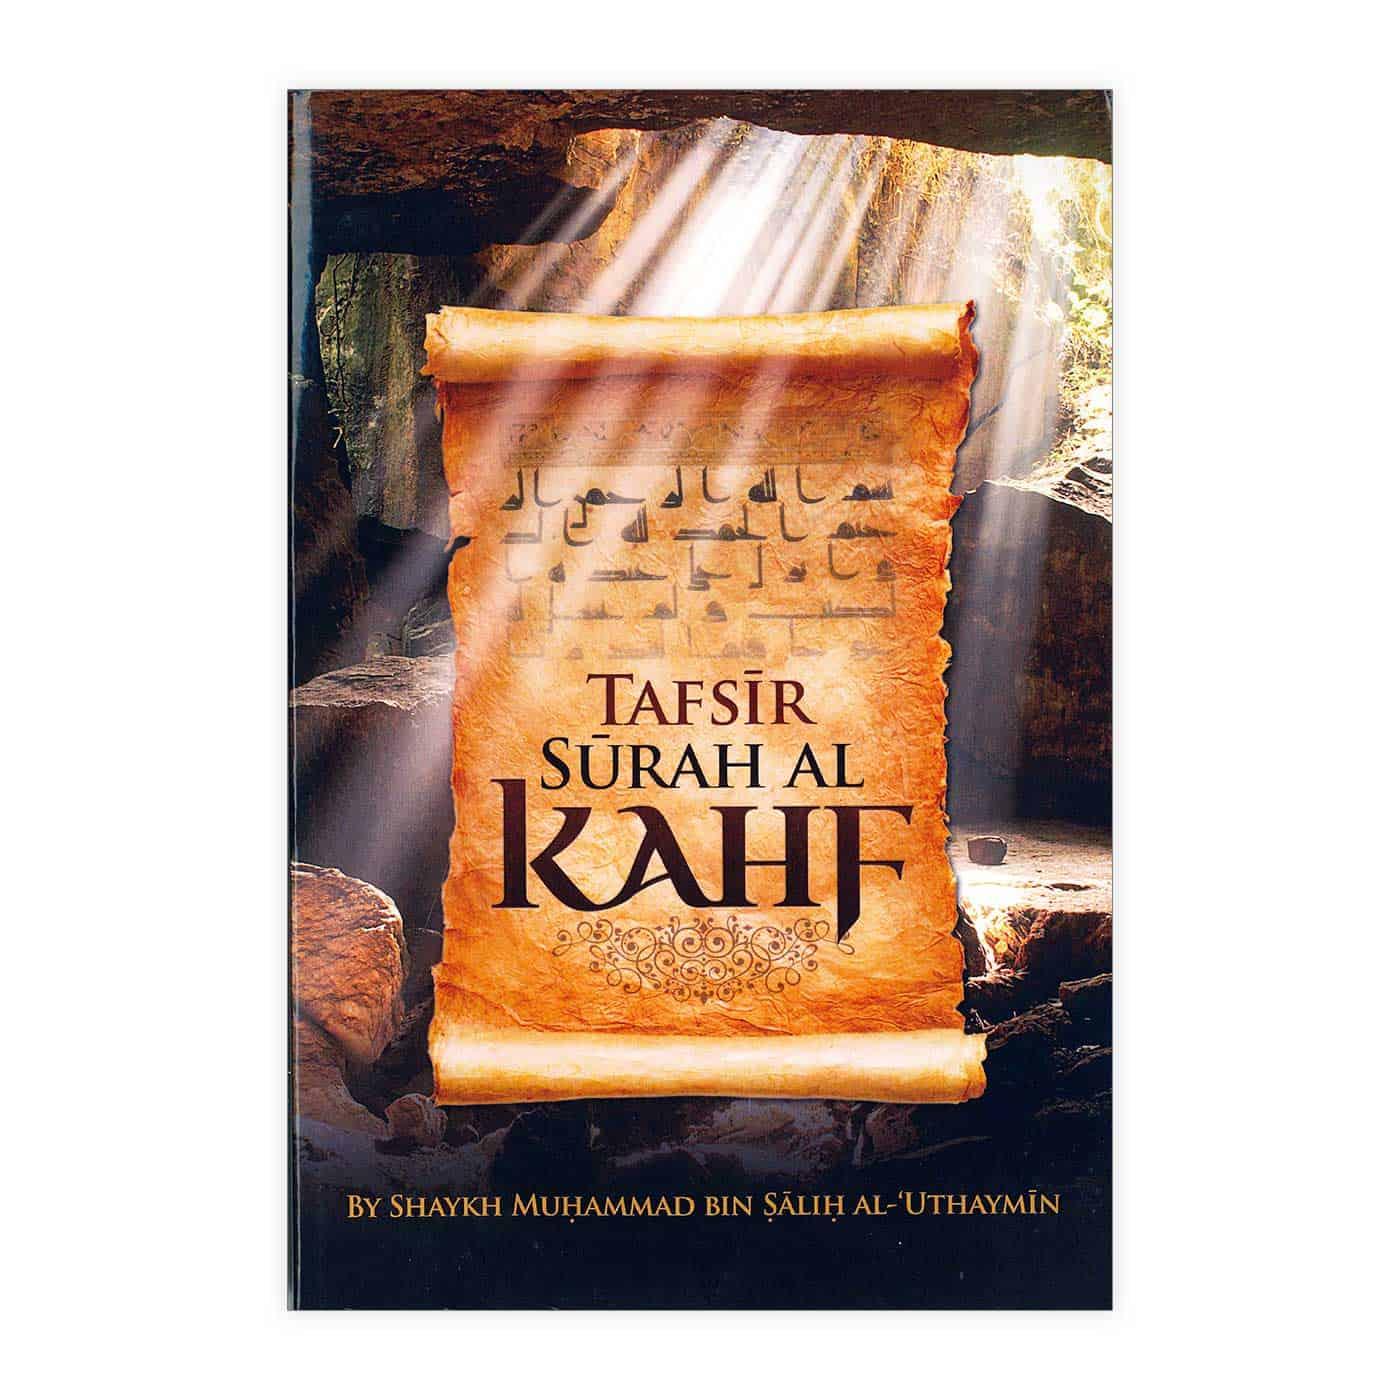 Buy Tafsir Surah Al Kahf, Nerd of Islam